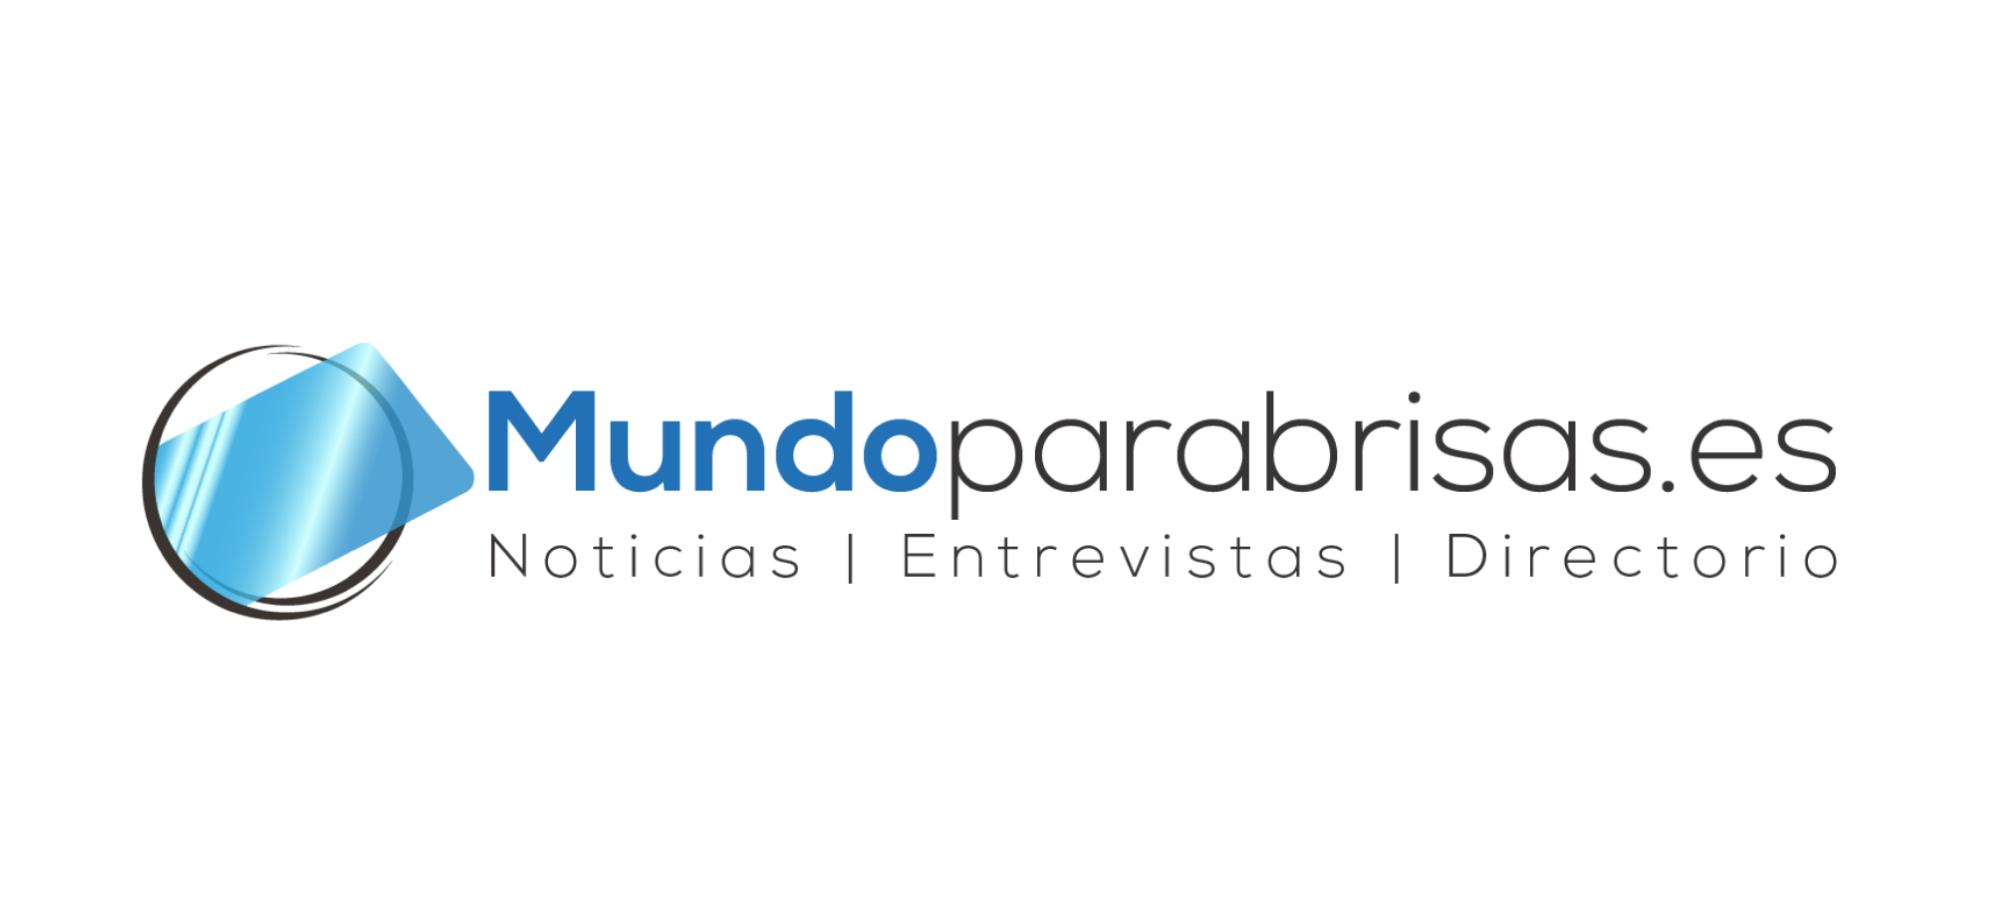 mundoparabrisas.es